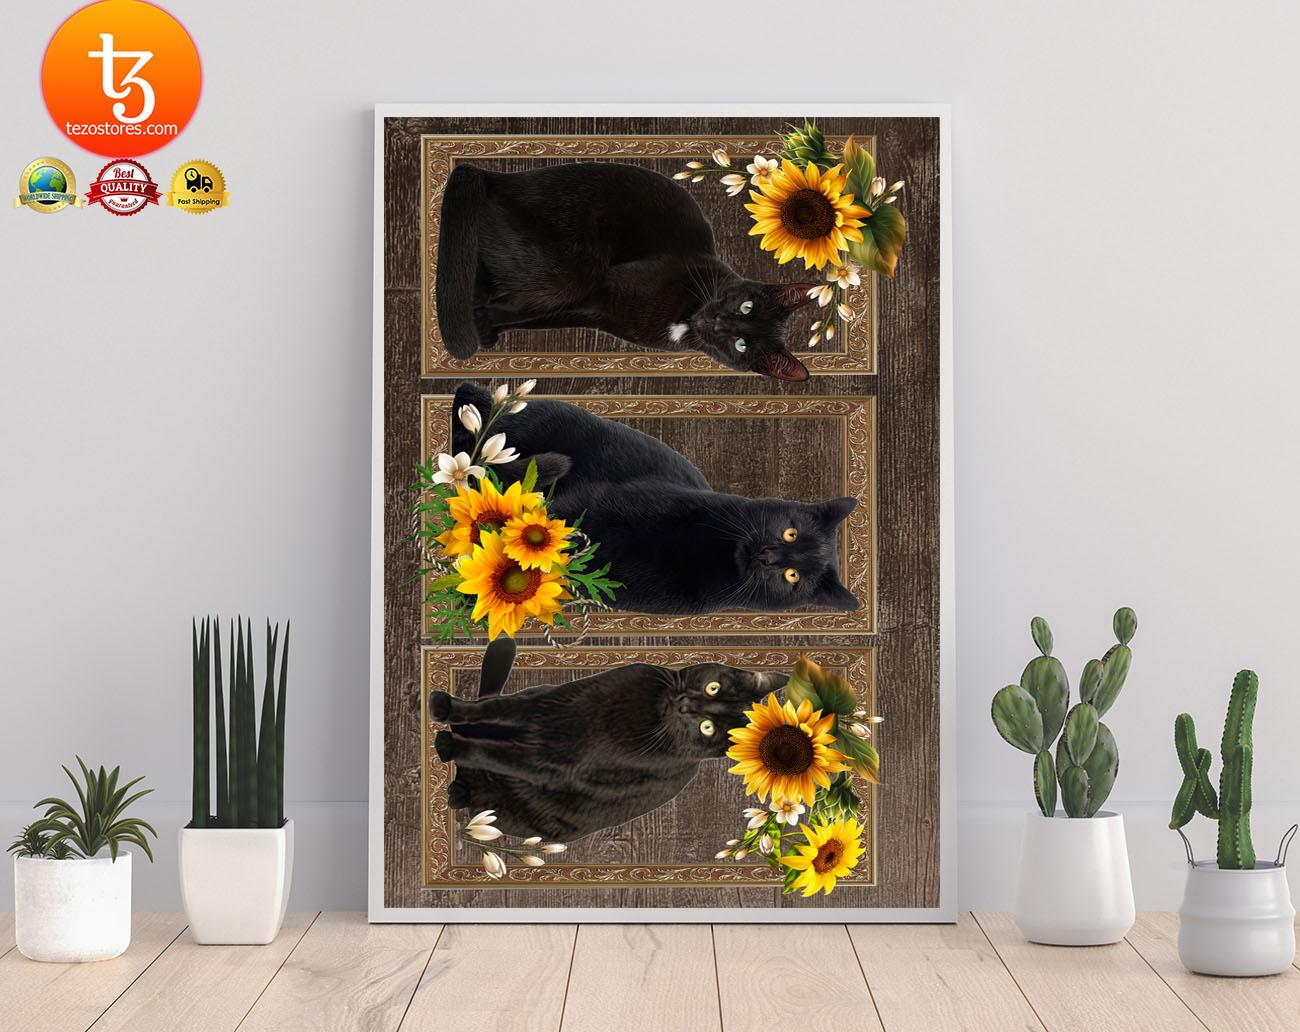 Black cat sunflower frame doormat 21